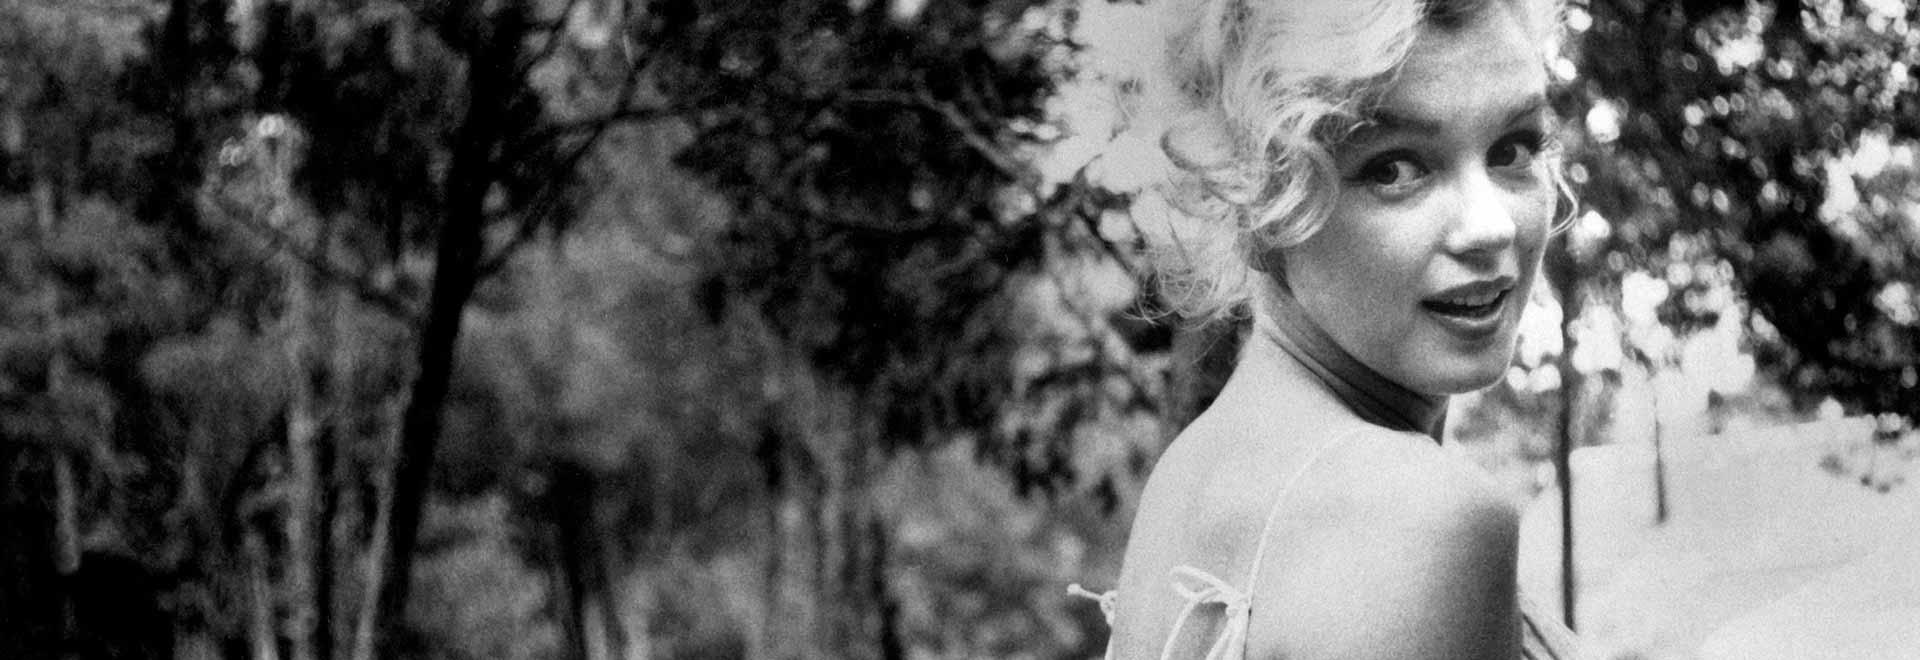 Chi ha ucciso Marilyn?